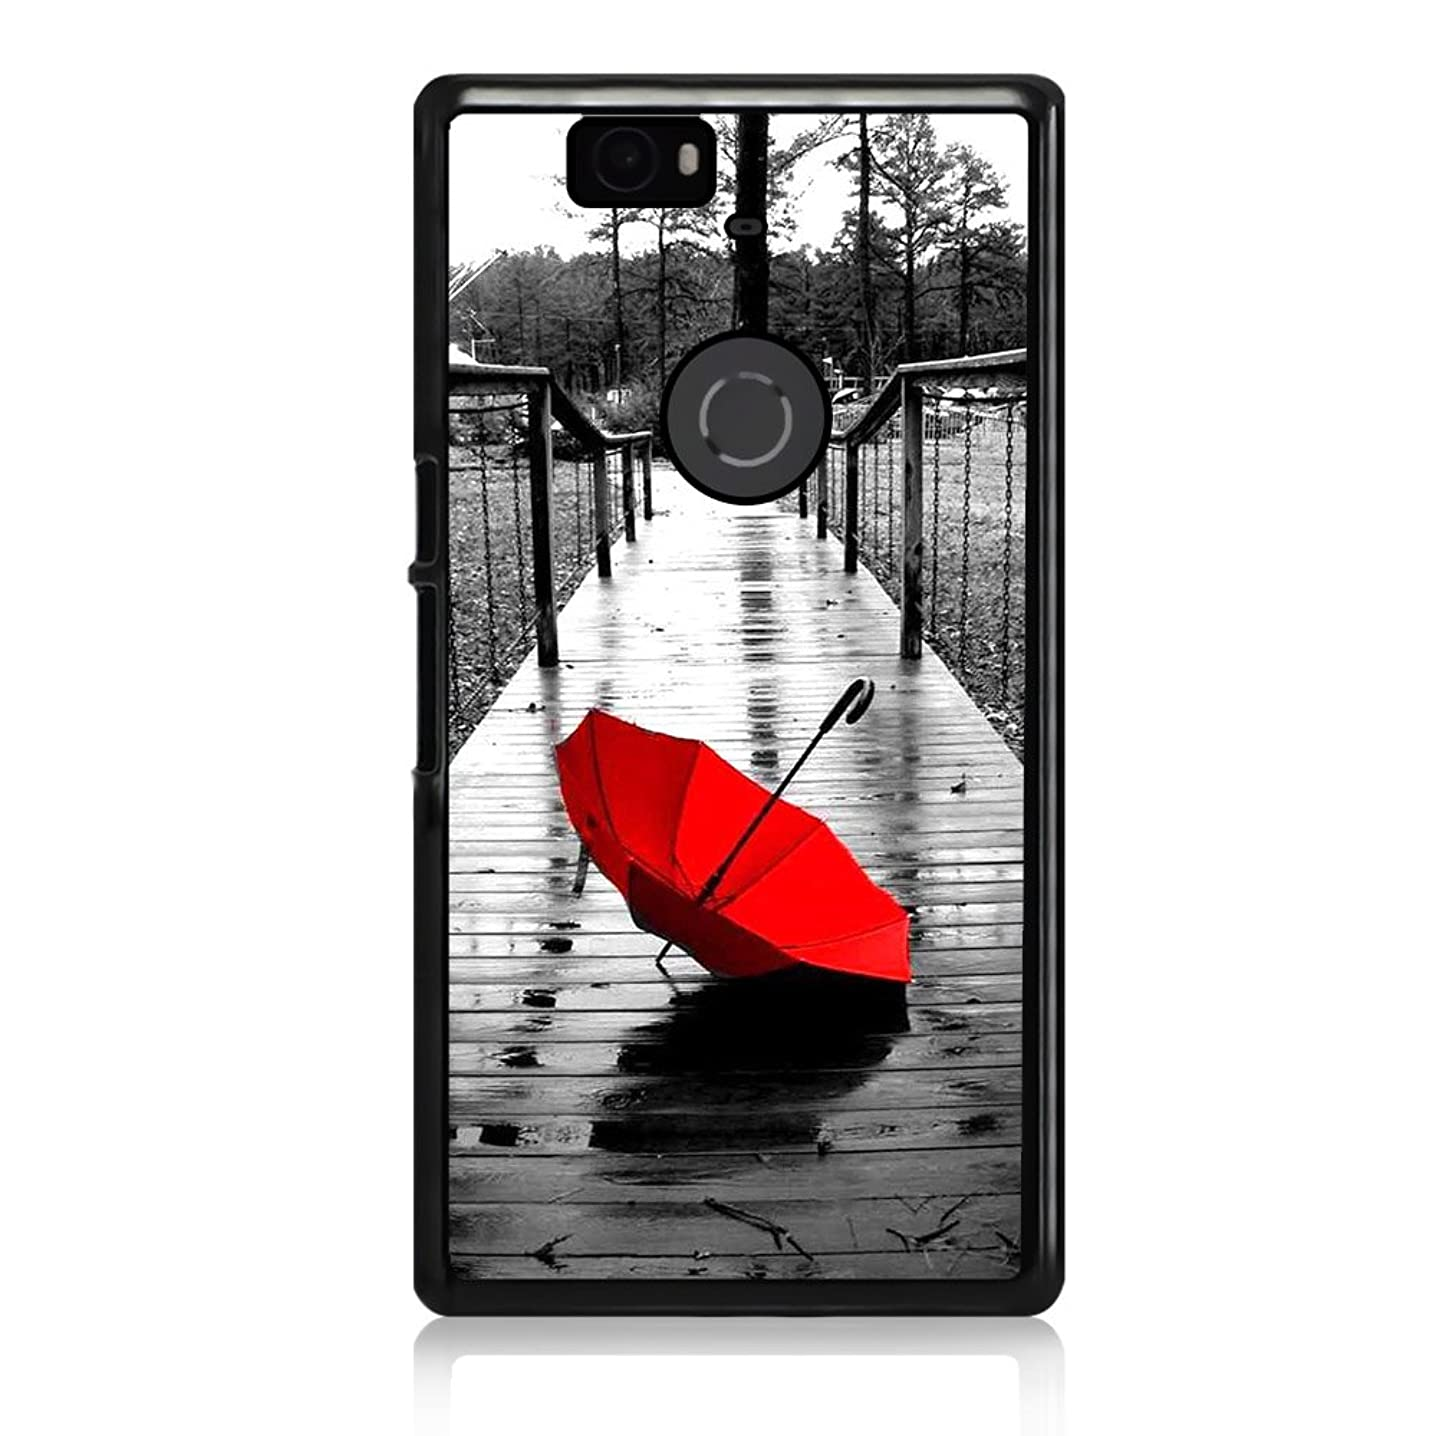 ( For Google Nexus 5 ) Case Cover Phone Case Back Cover - HOT10065 Red Umbrella